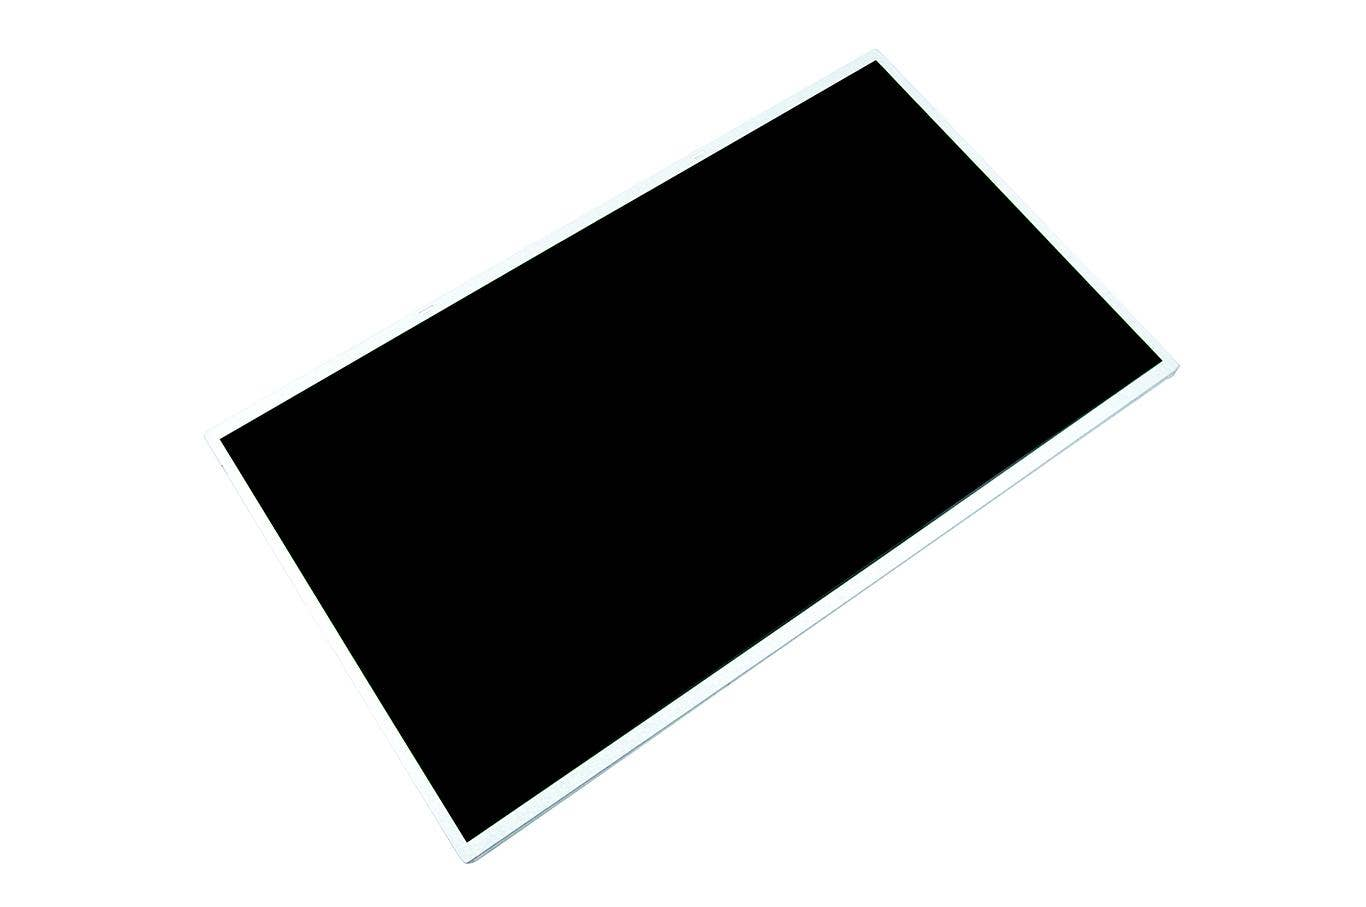 Tela bringIT compatível com Notebook Toshiba Satellite C670 - 1D3 17.3 ´ LED